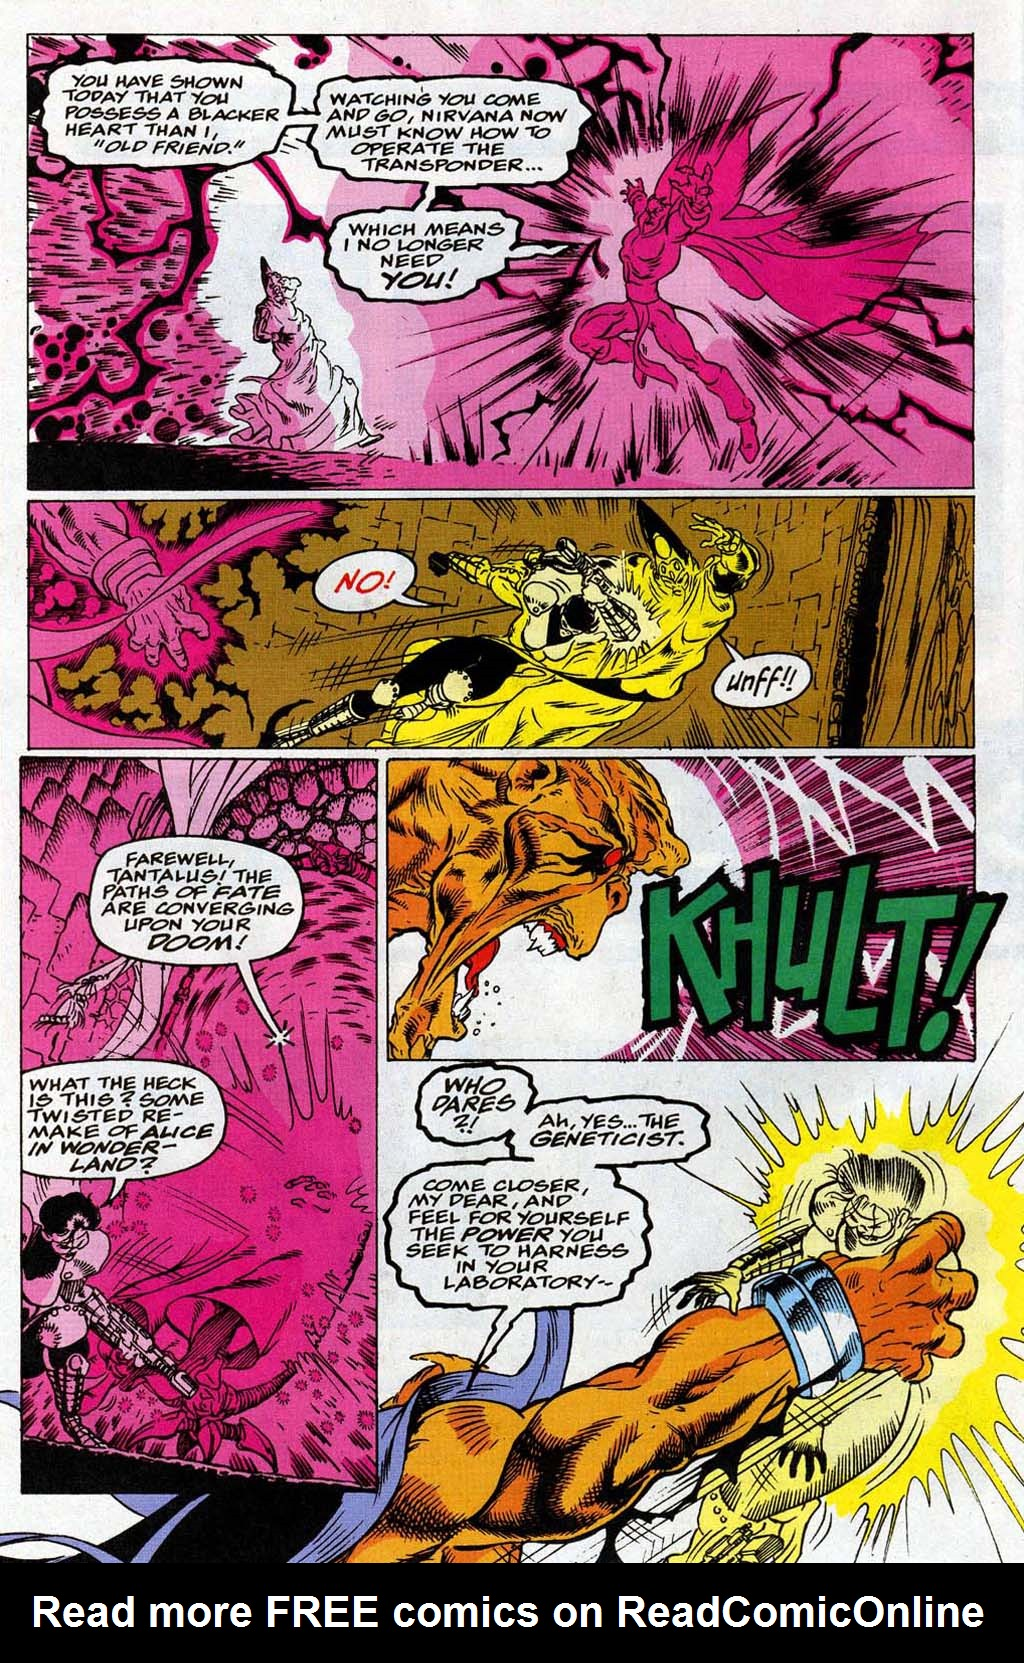 Read online Blackwulf comic -  Issue #9 - 7